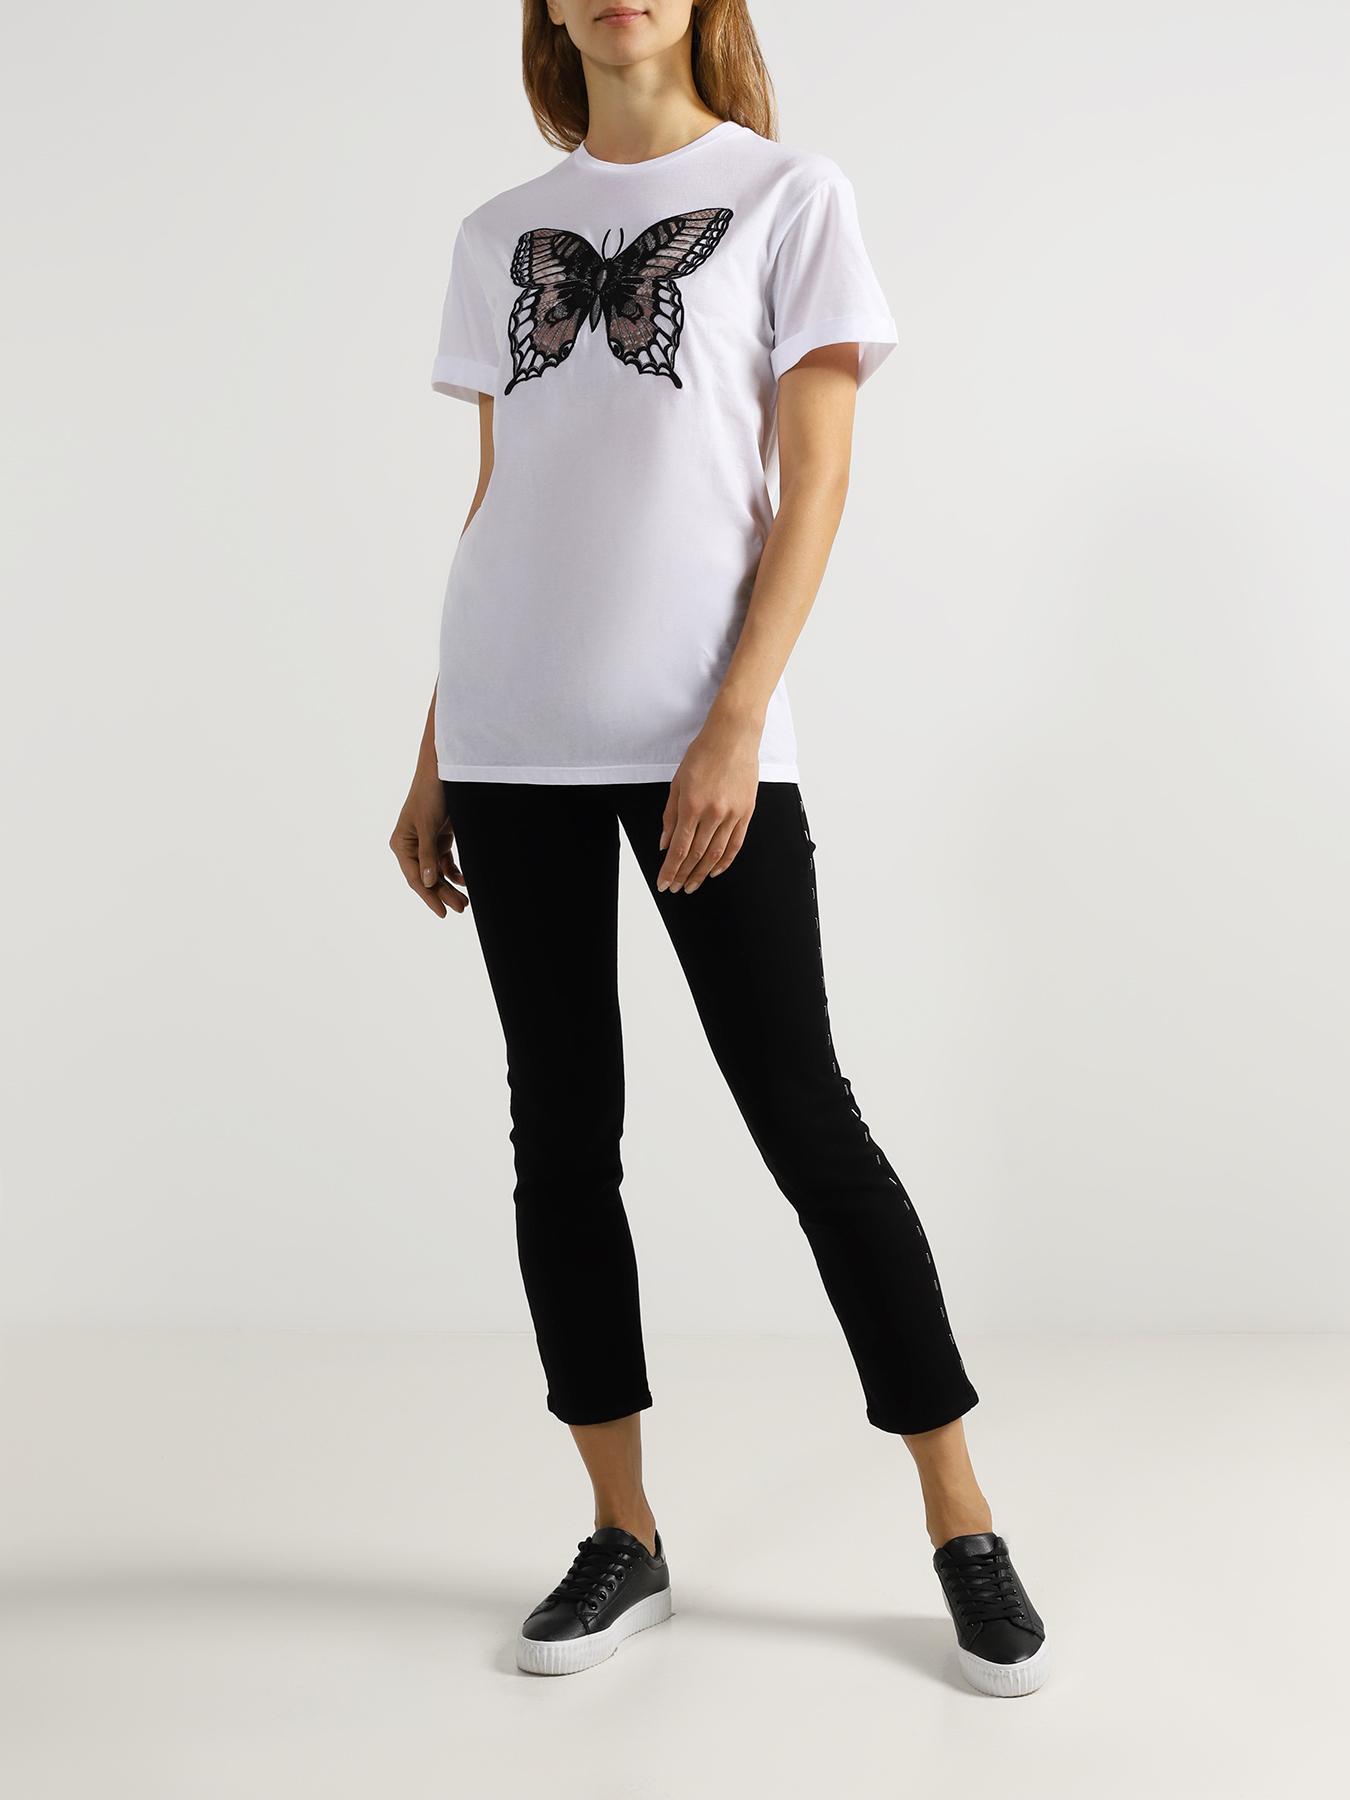 TWINSET Женская футболка 349626-042